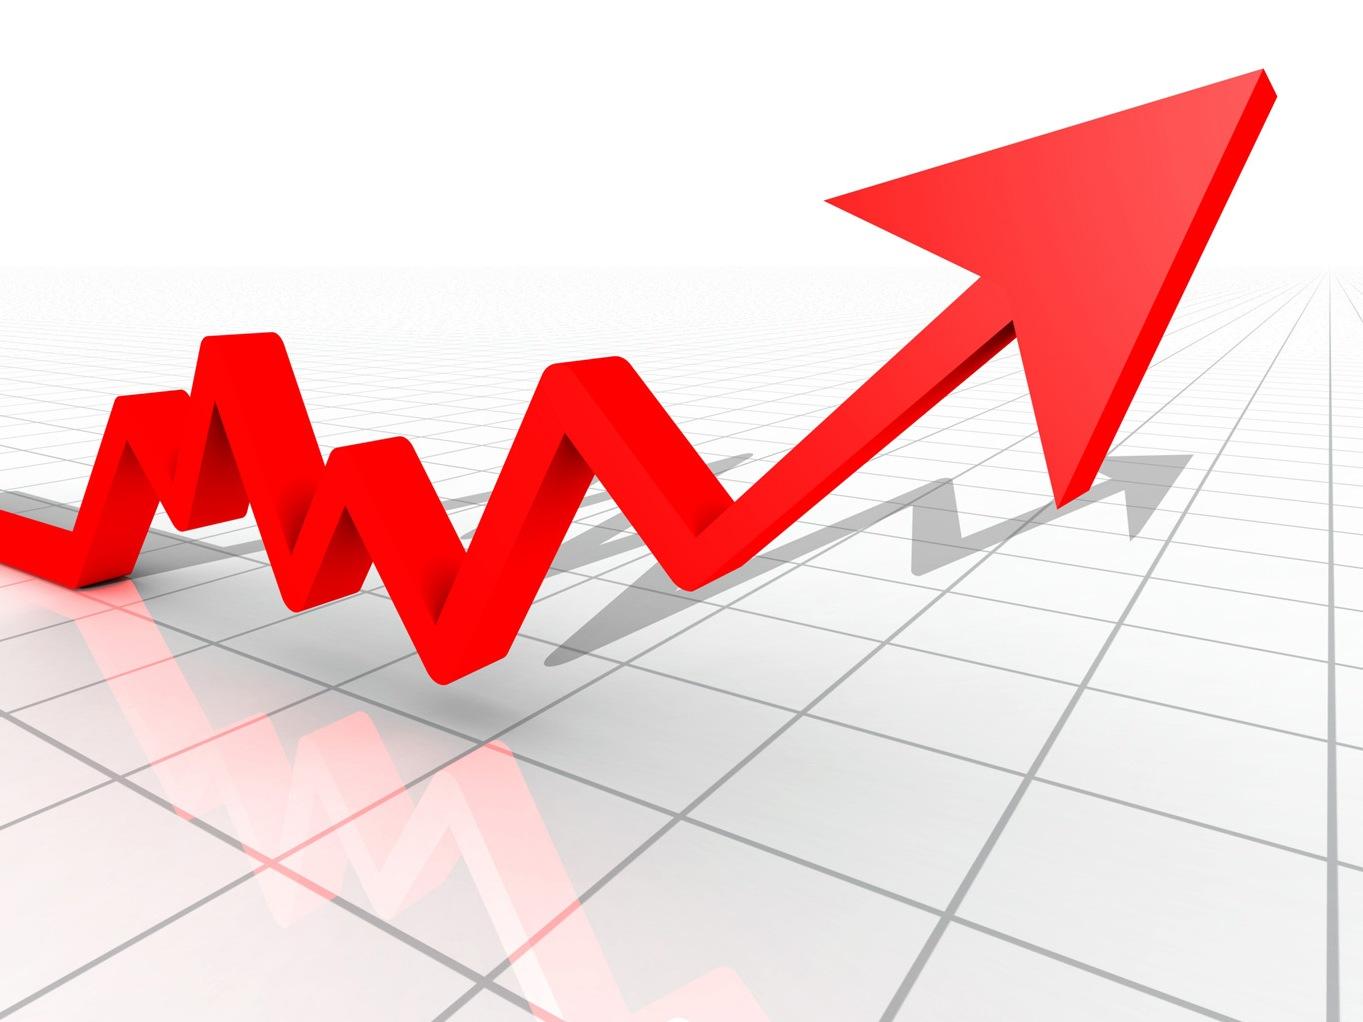 Greek economy: Stronger signs of improvement